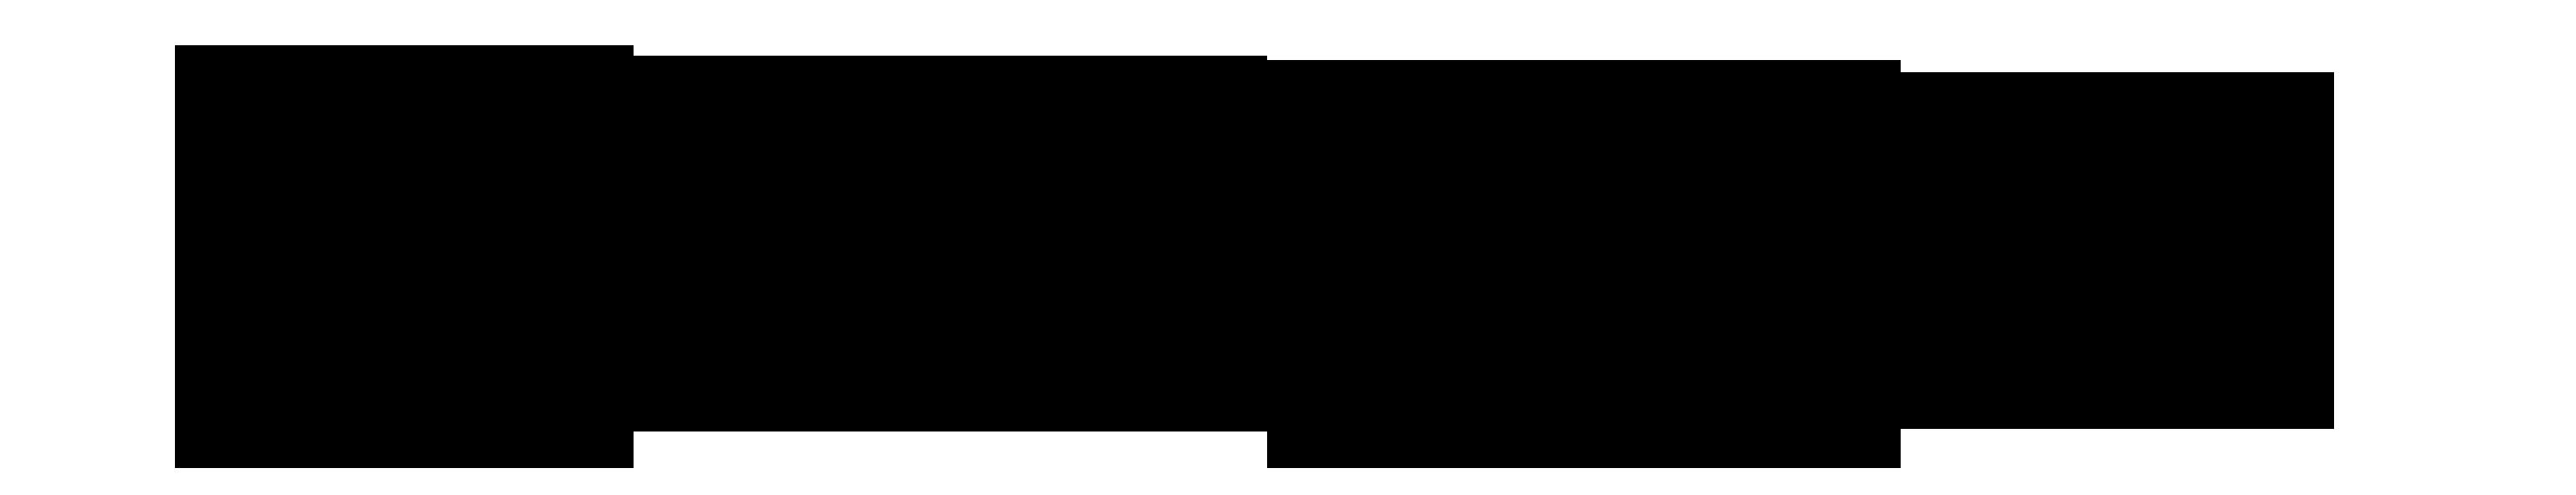 Typeface-Heimat-Sans-F15-Atlas-Font-Foundry